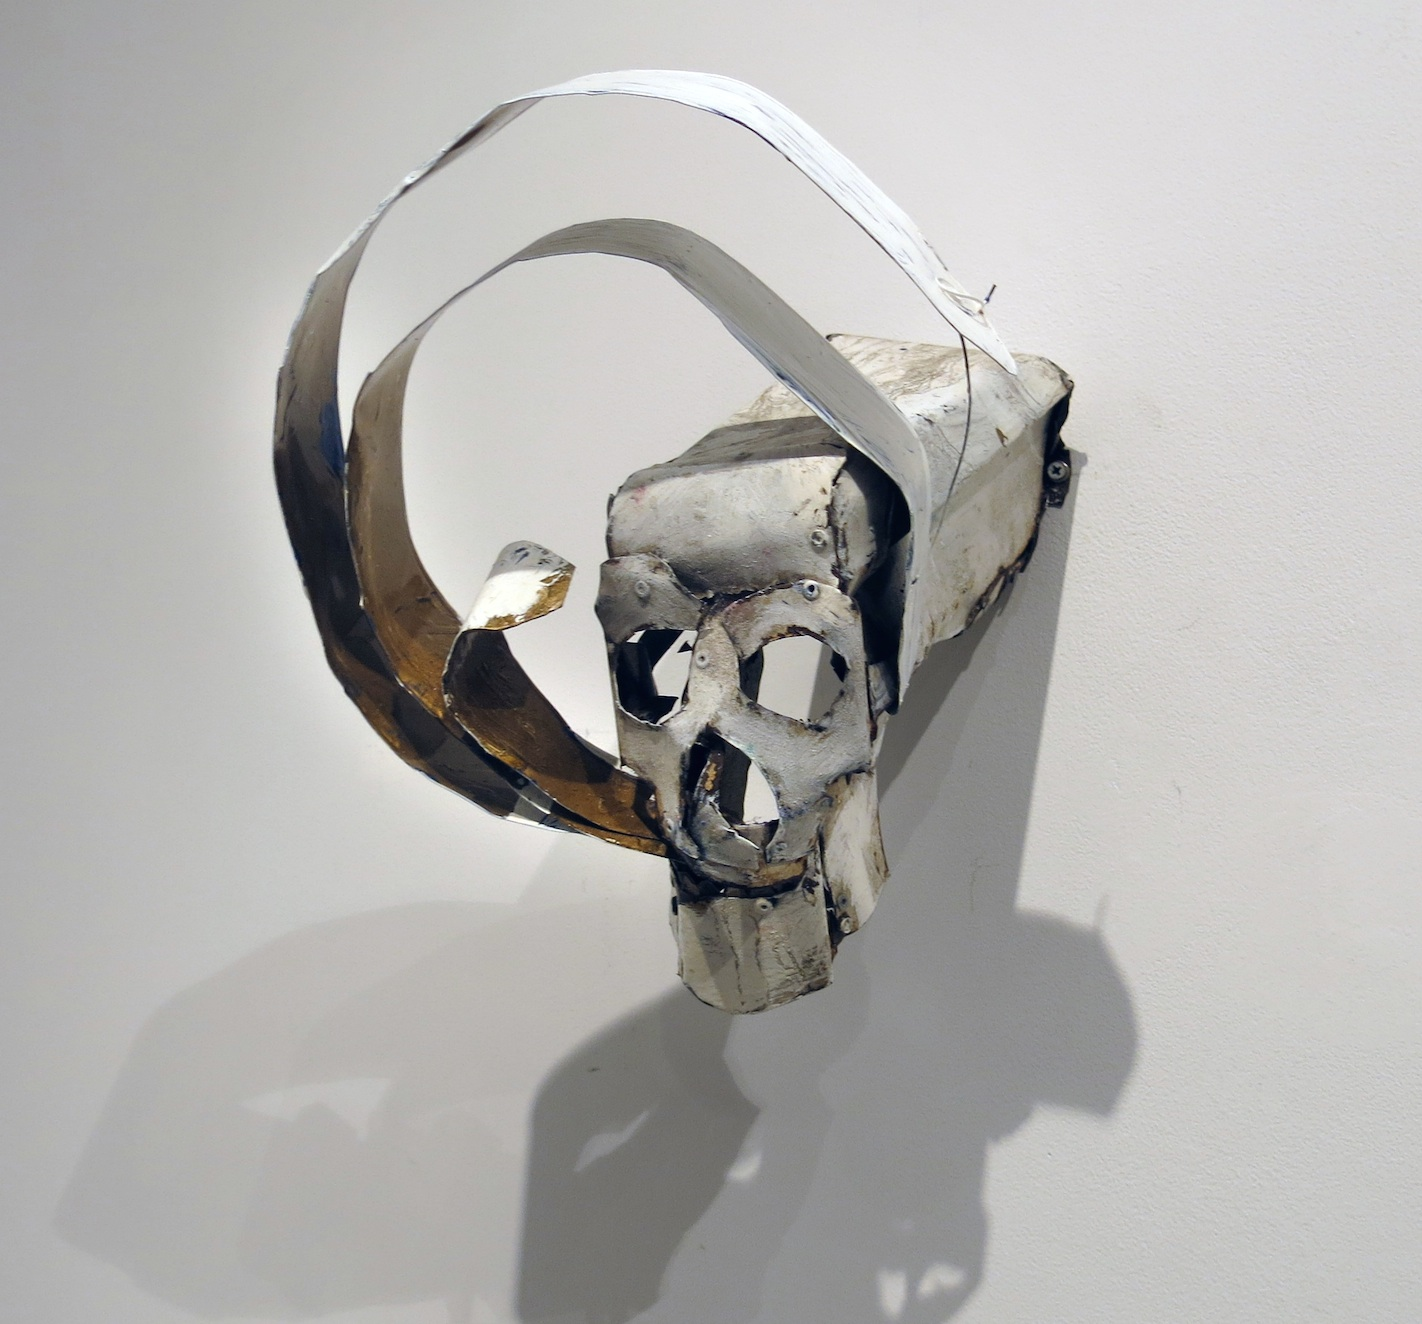 Matt Blackwell, Speaking in Circles, 2014, metal, wire, paint, 11h x 11w x 14d in.